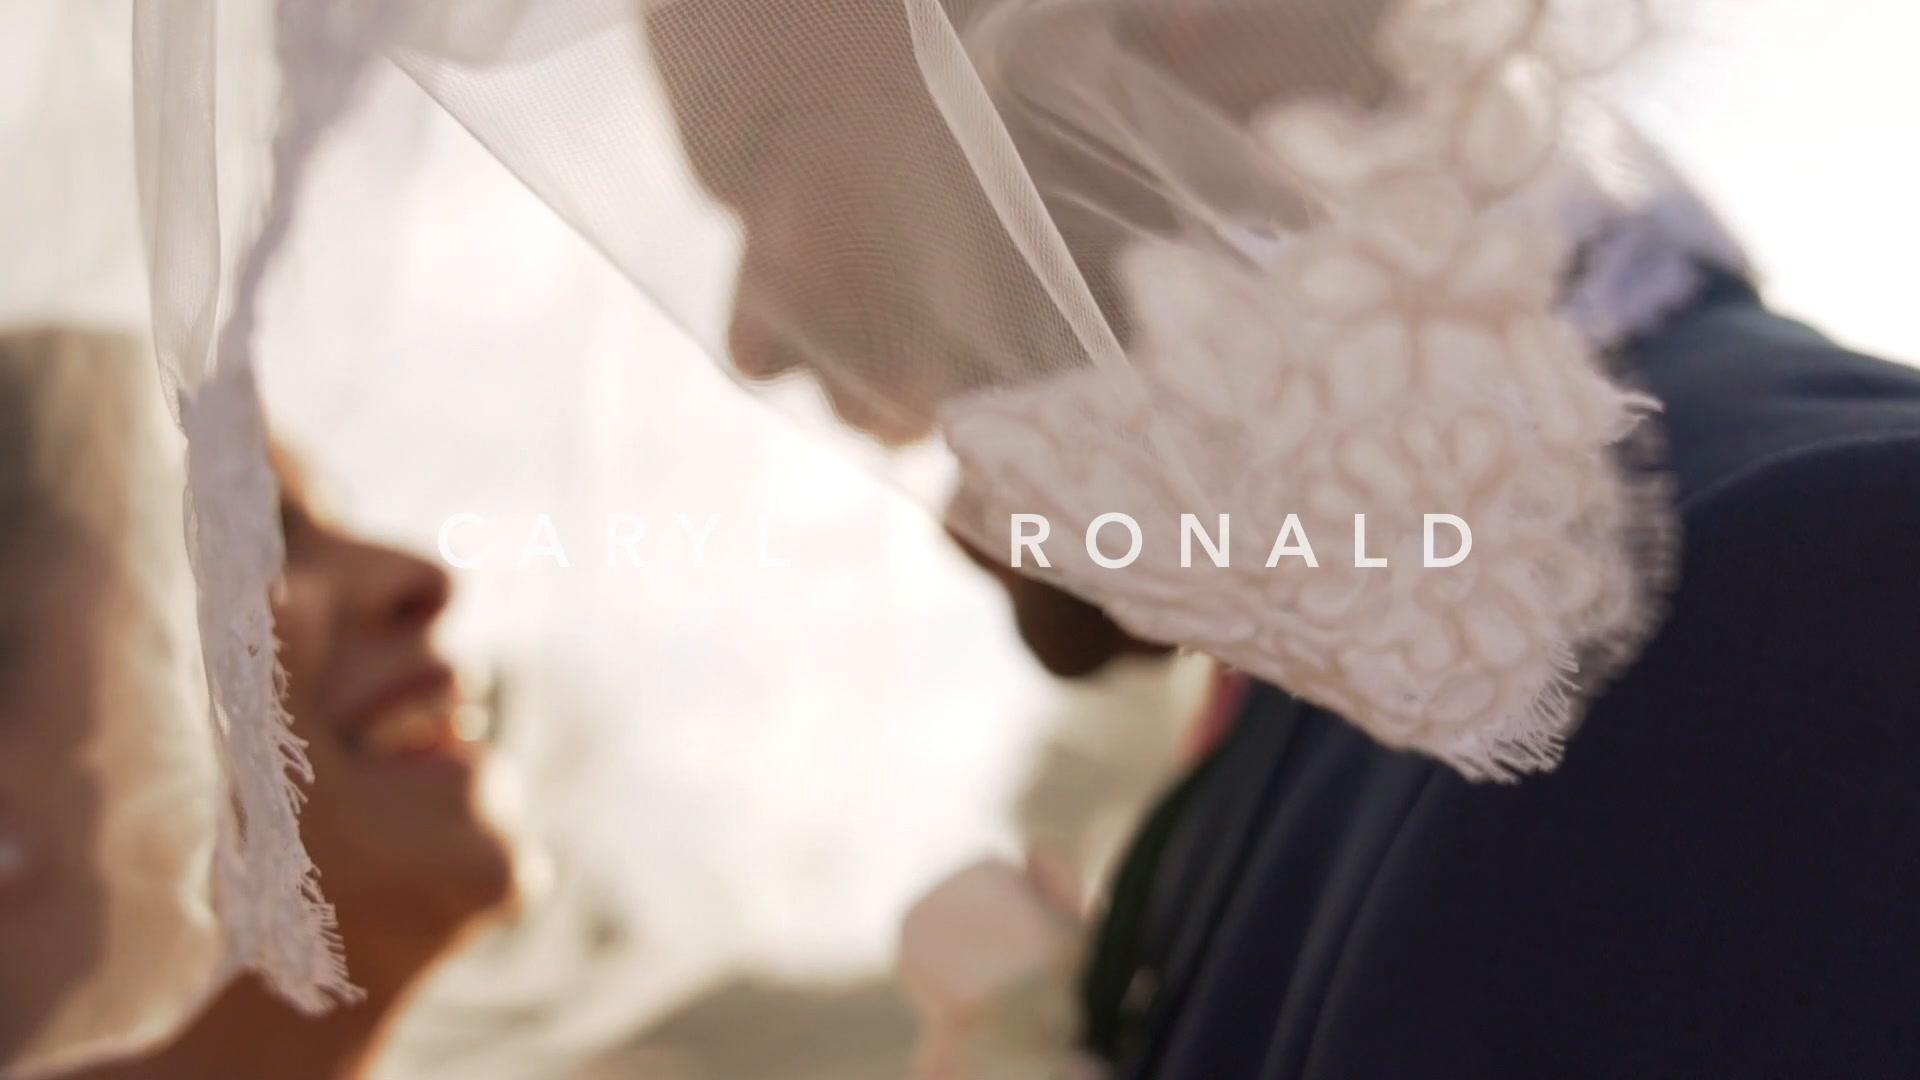 Caryl + Ronald | Punta Cana, Dominican Republic | Casa Club Punta Cana